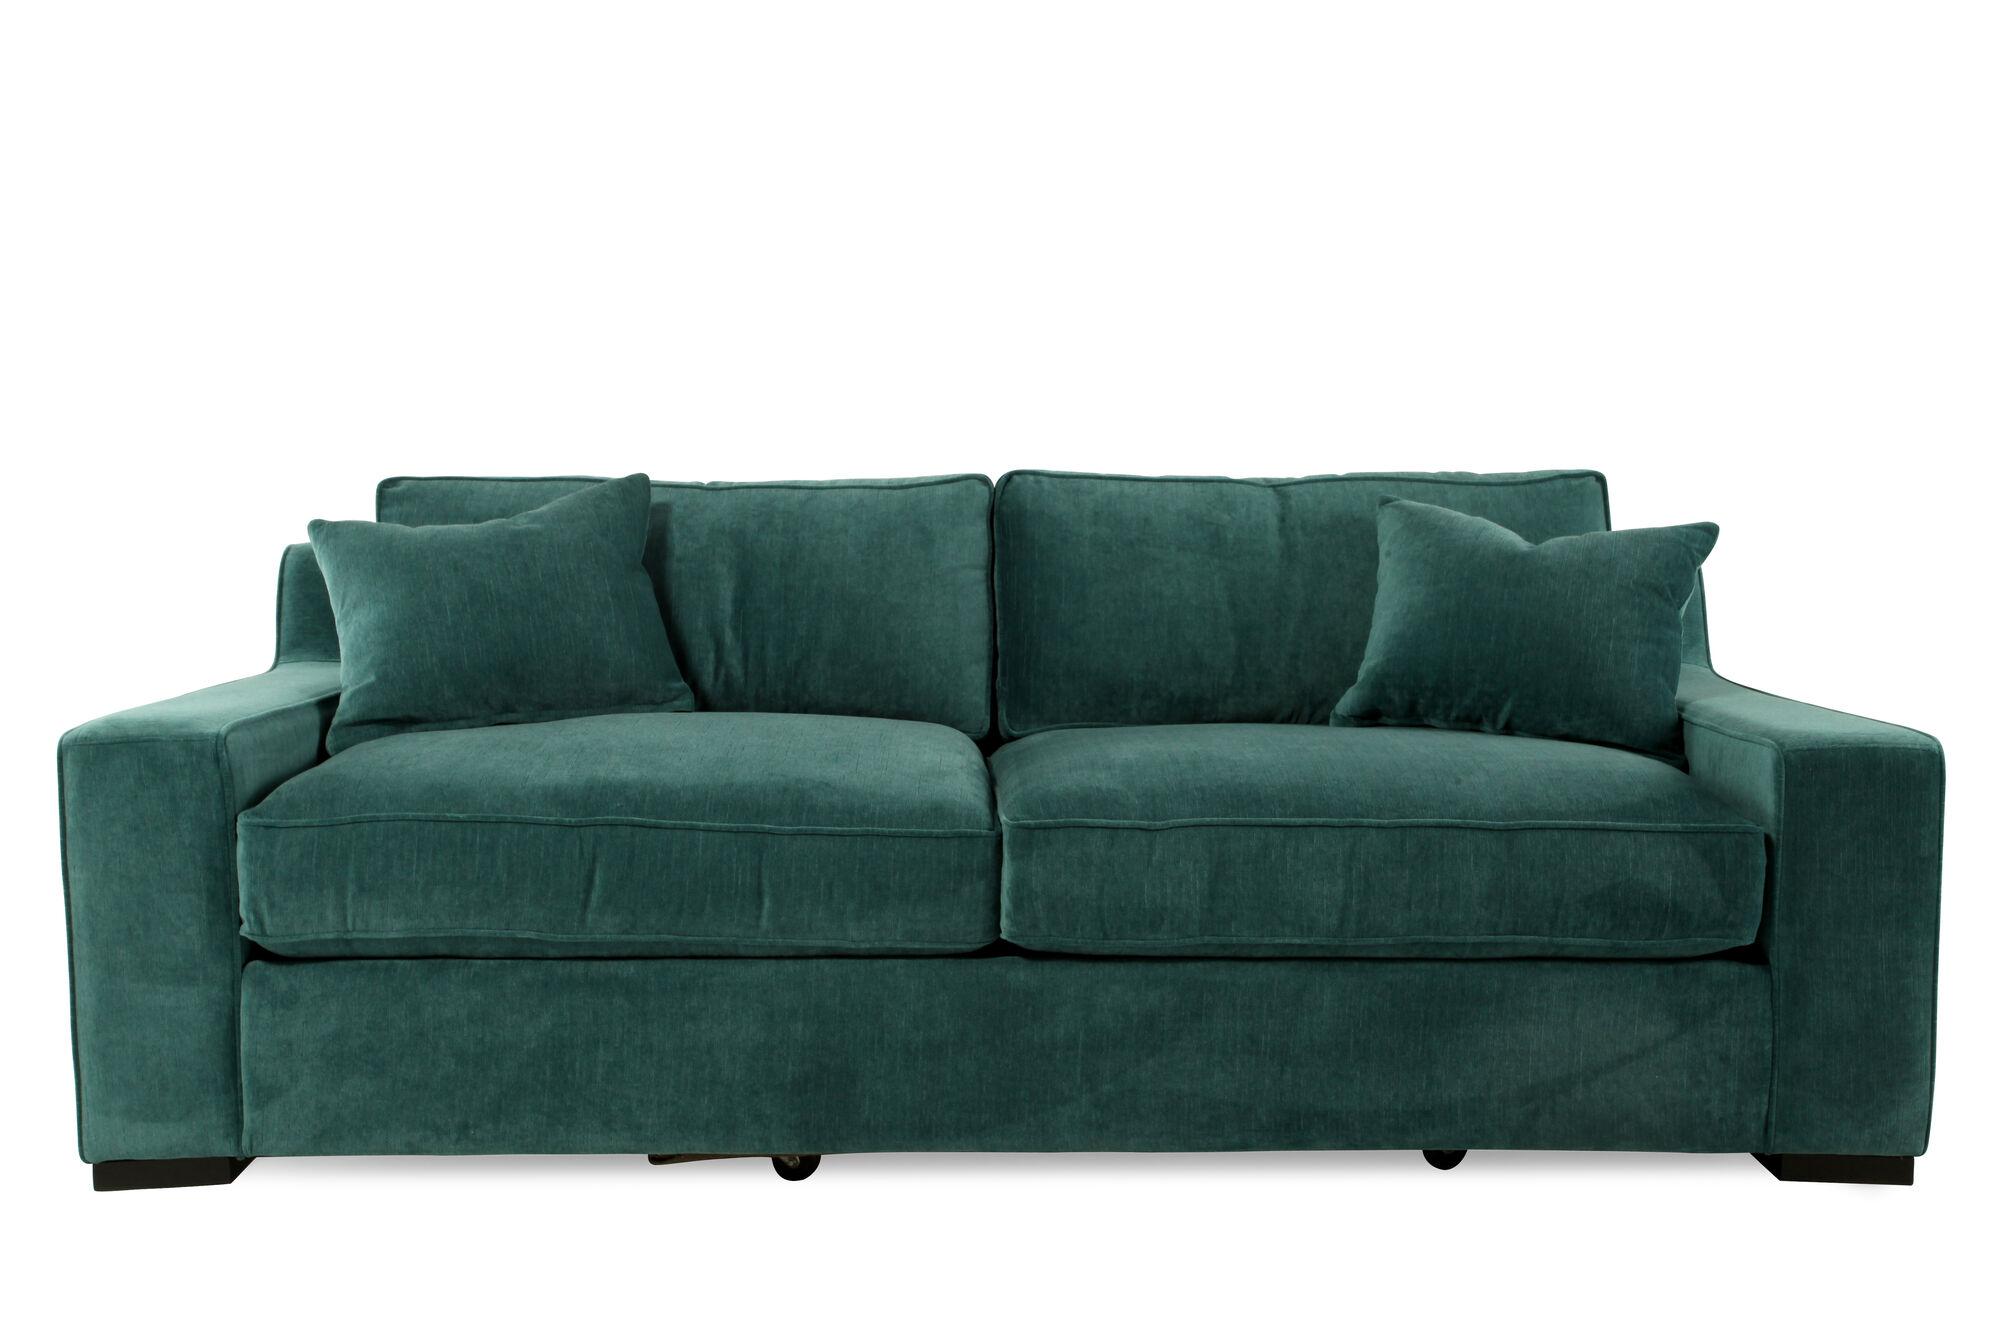 Low Profile Microfiber 38 Sofa In Emerald Green Mathis Brothers Furniture